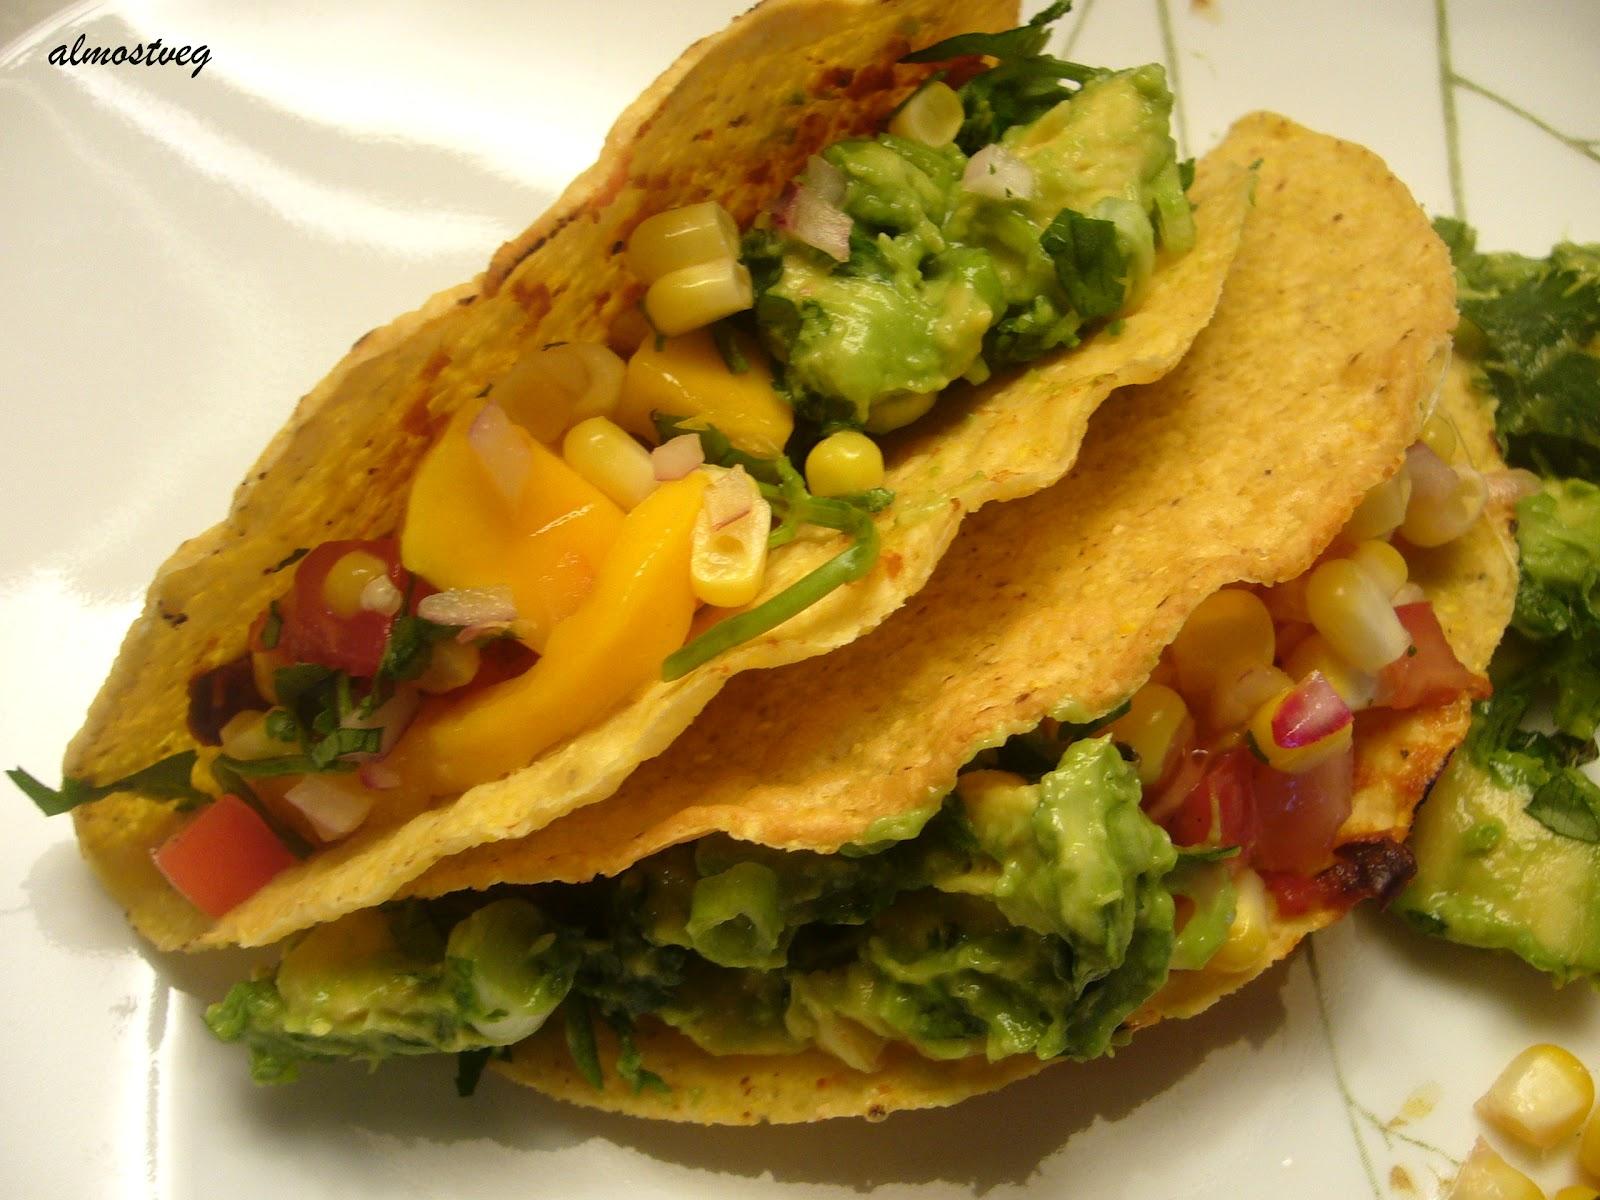 almostveg: Black bean taco with mango salsa